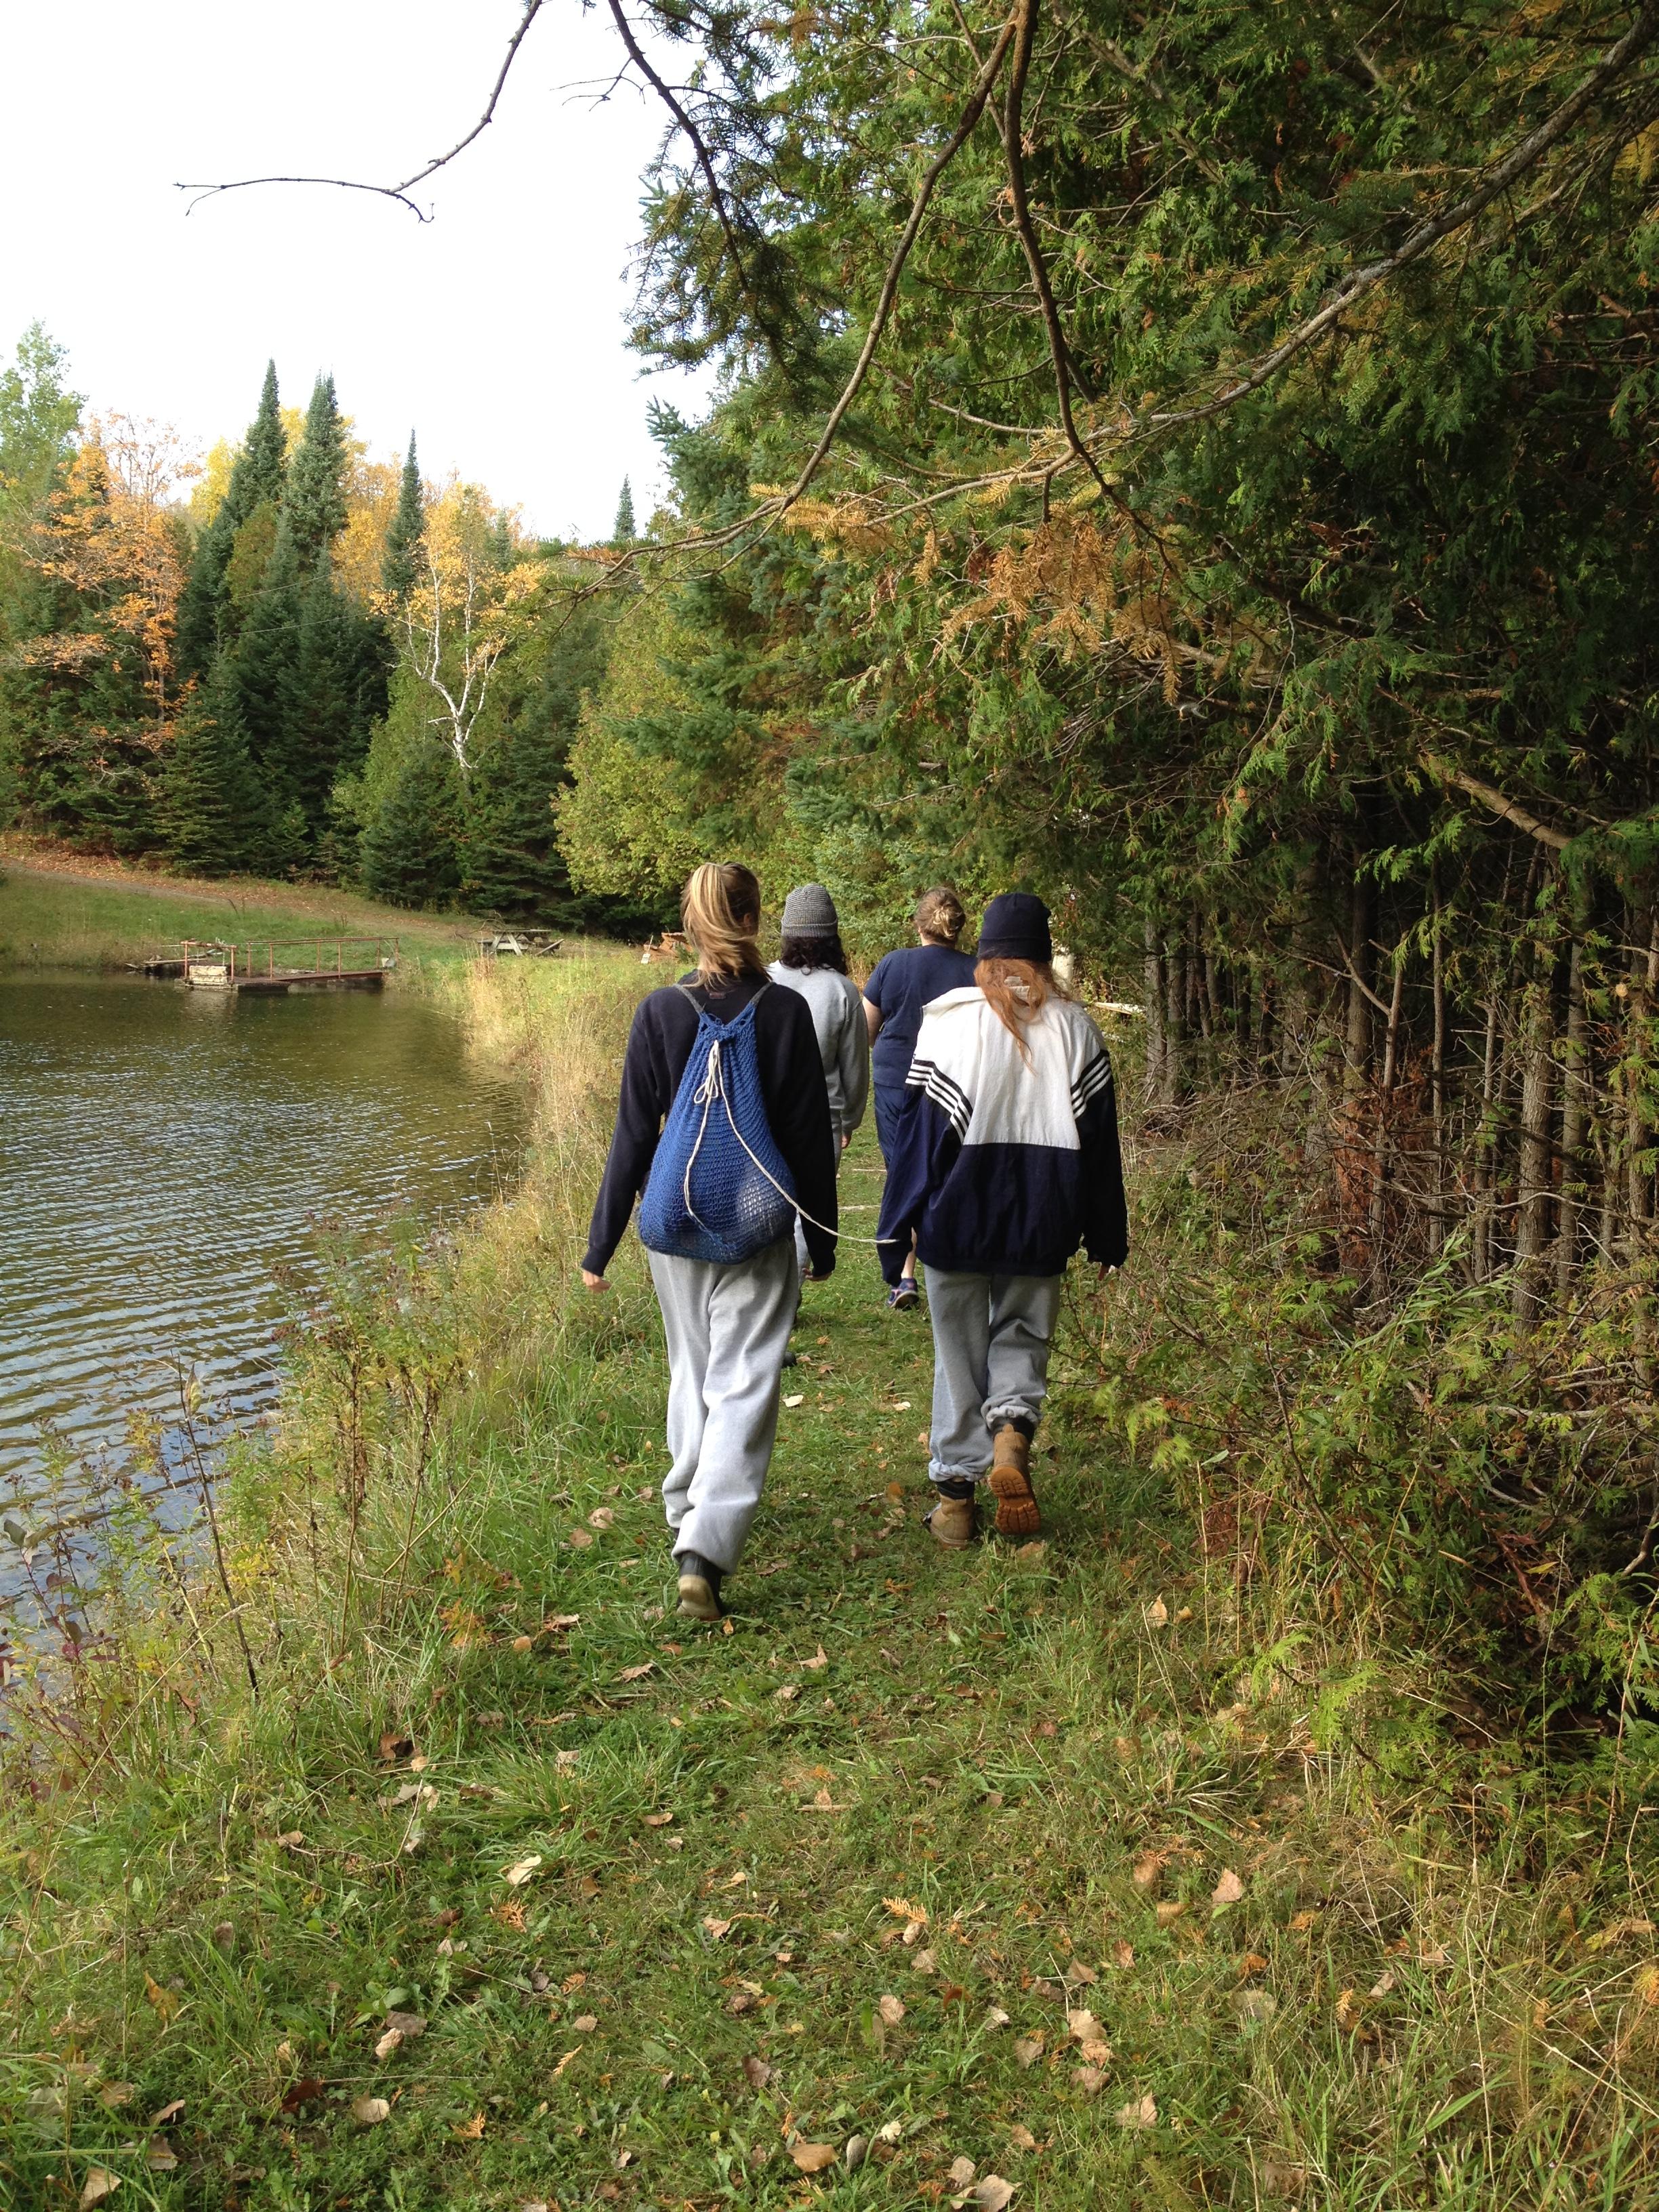 Pond Oct 2014.jpg